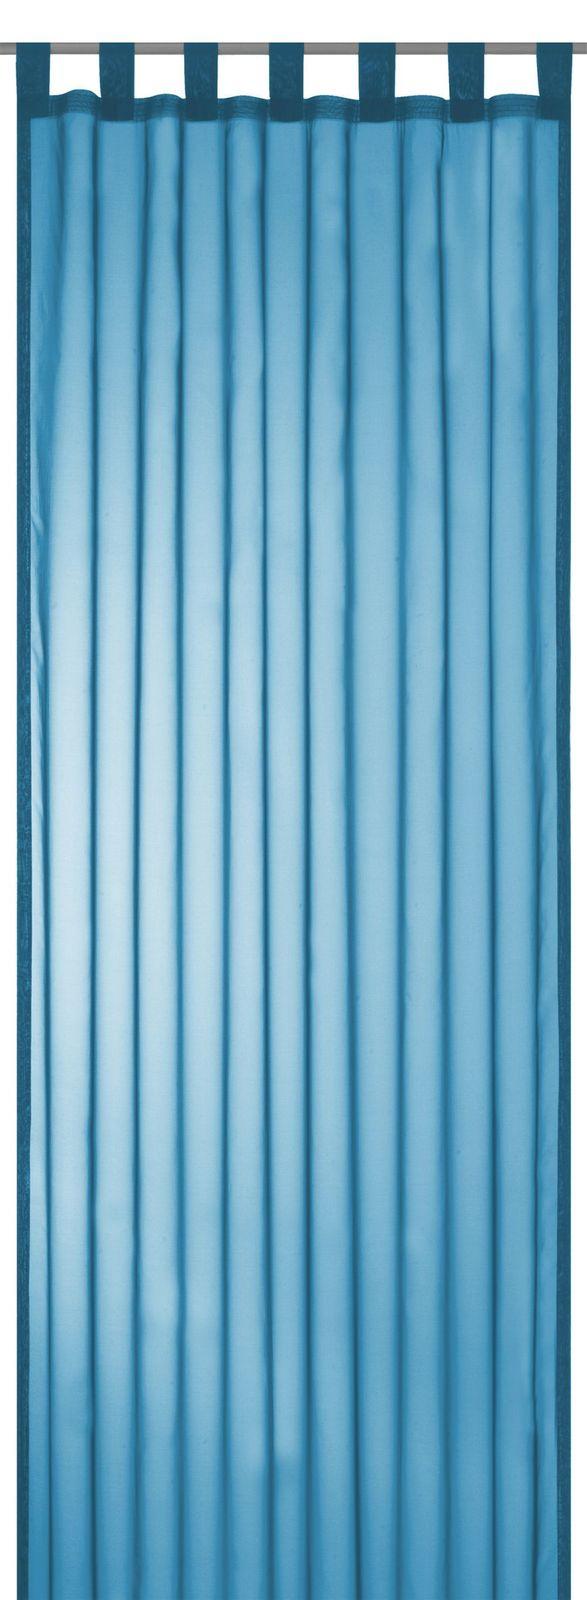 schlaufenschal transparent feel good uni einfarbig blau 198268. Black Bedroom Furniture Sets. Home Design Ideas